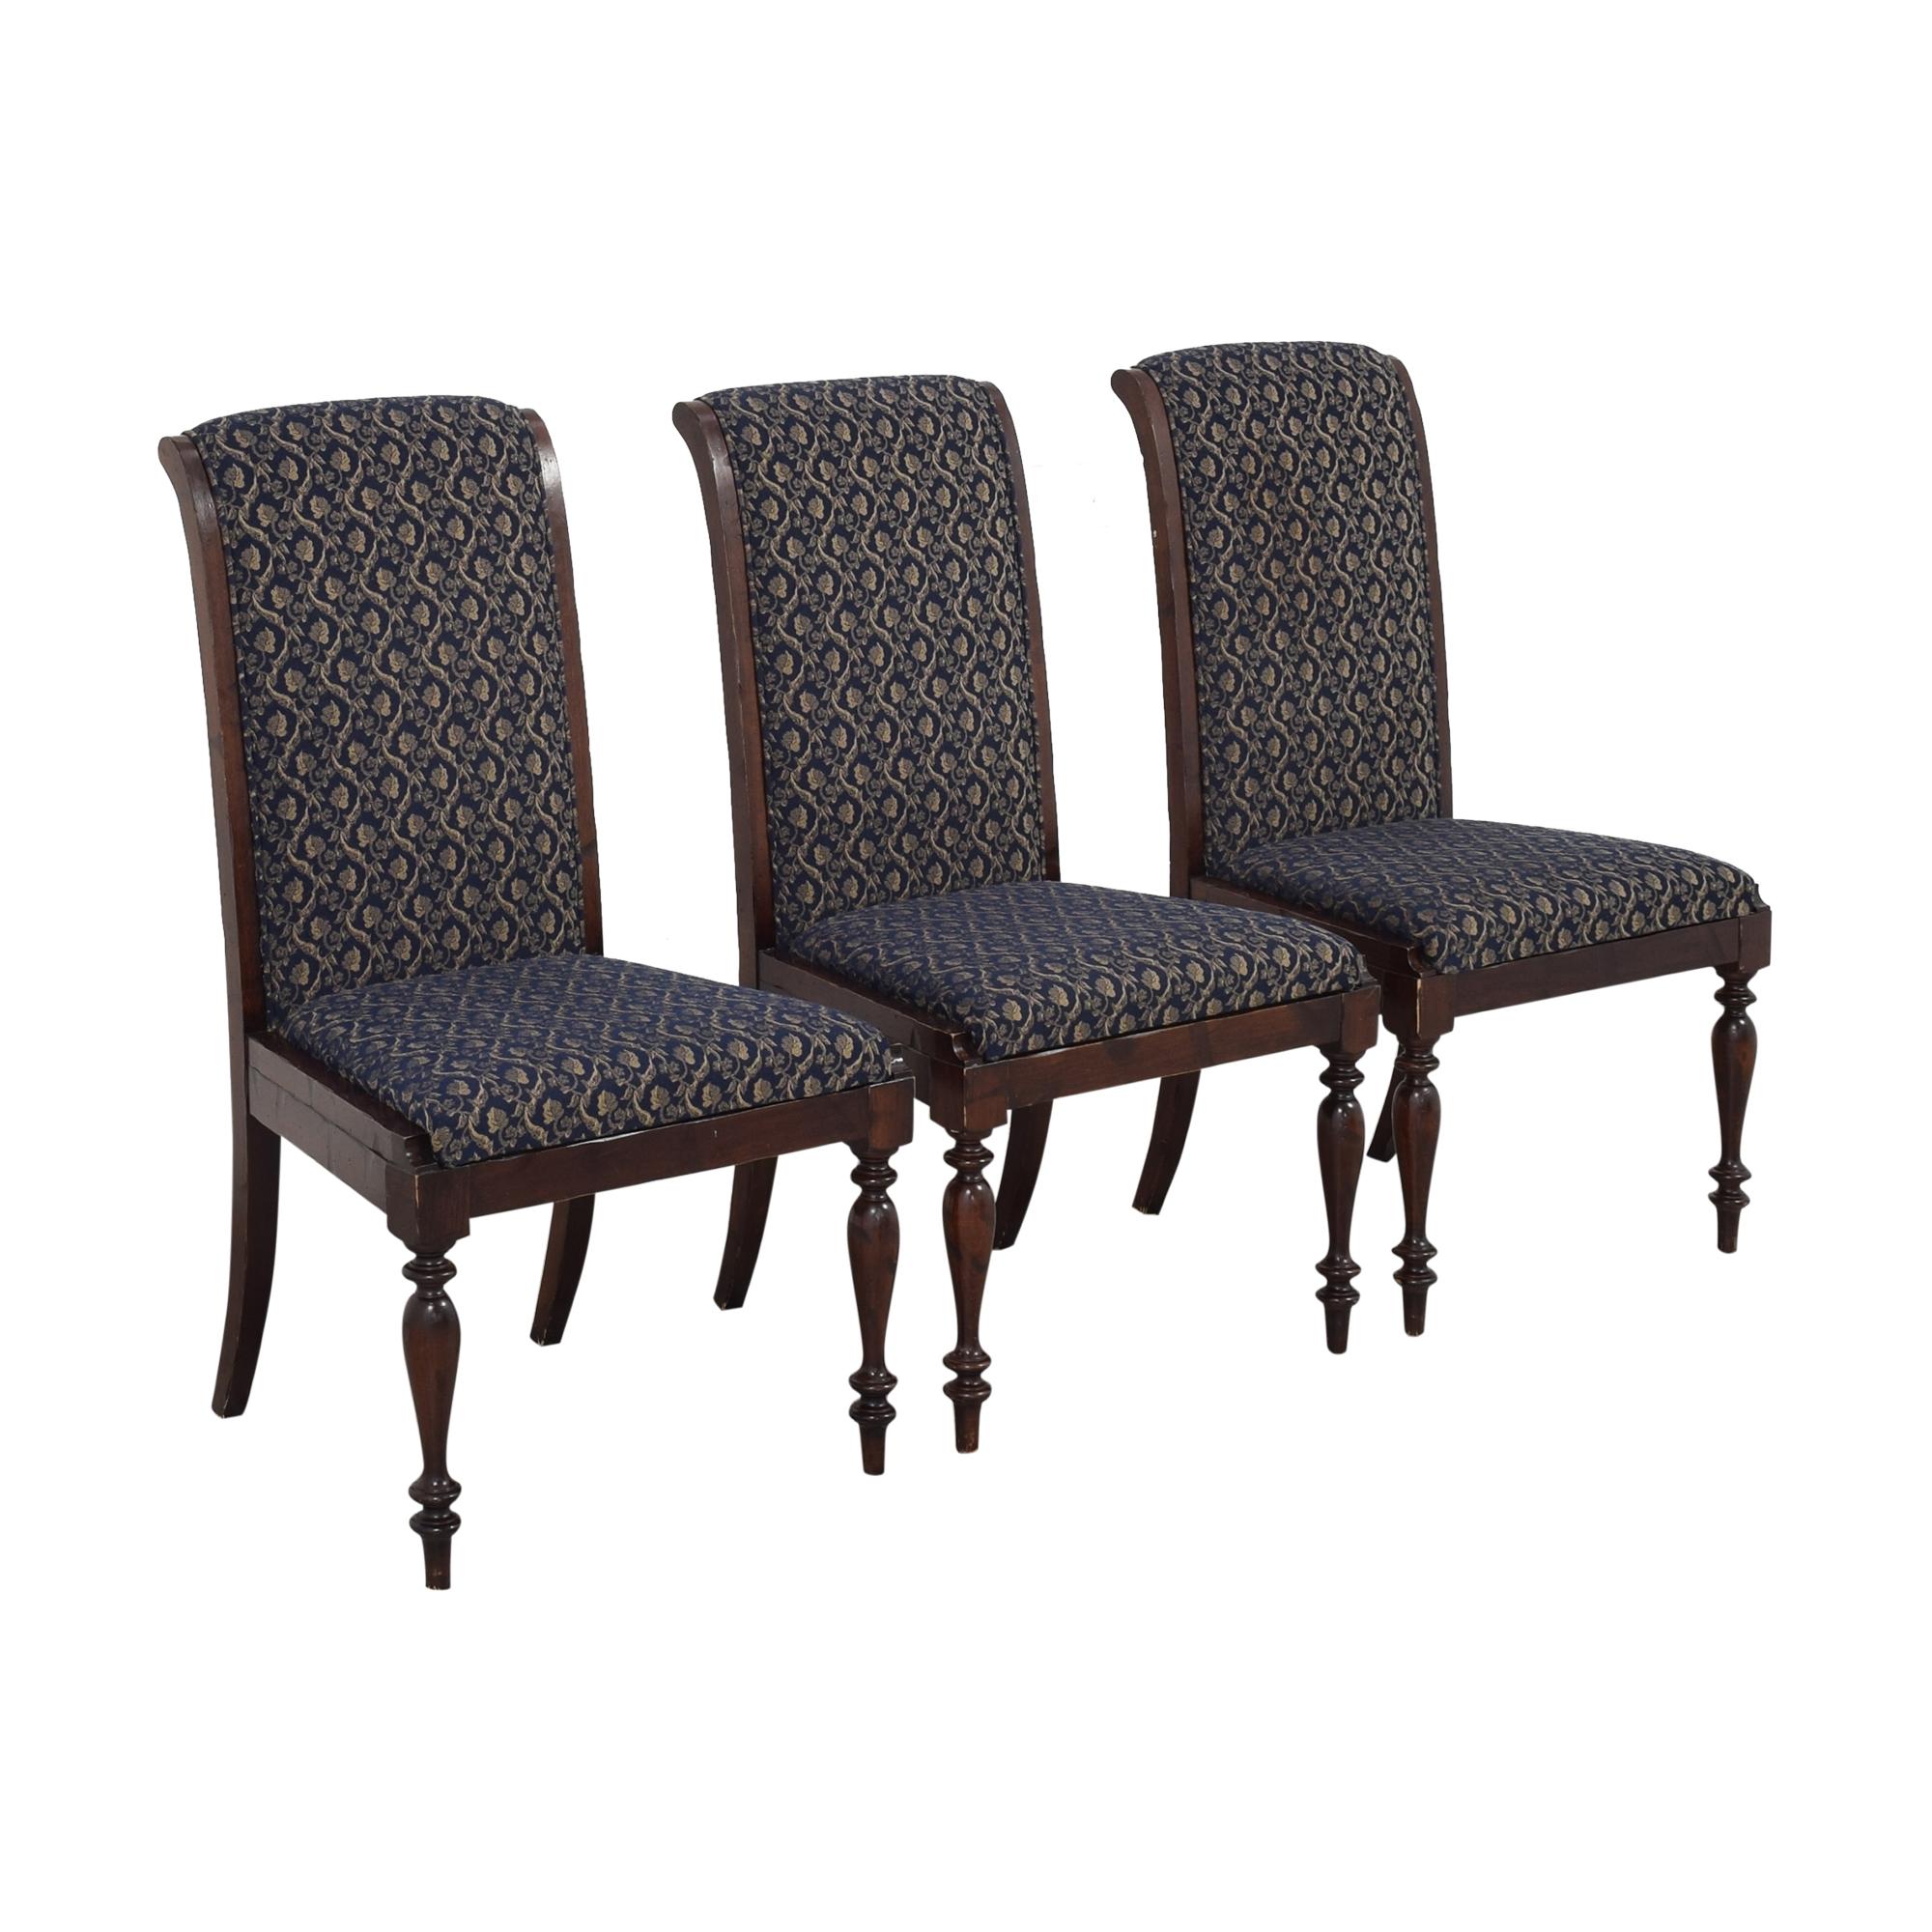 buy Sacchetto Fratelli Upholstered High Back Dining Chairs Sacchetto Fratelli Chairs